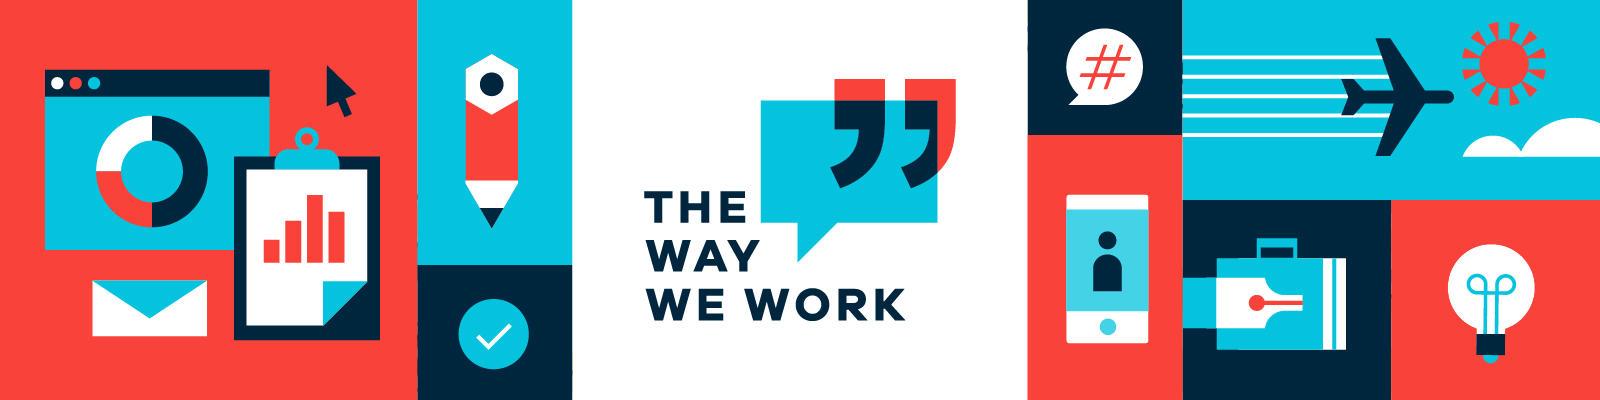 The Way We Work Series banner